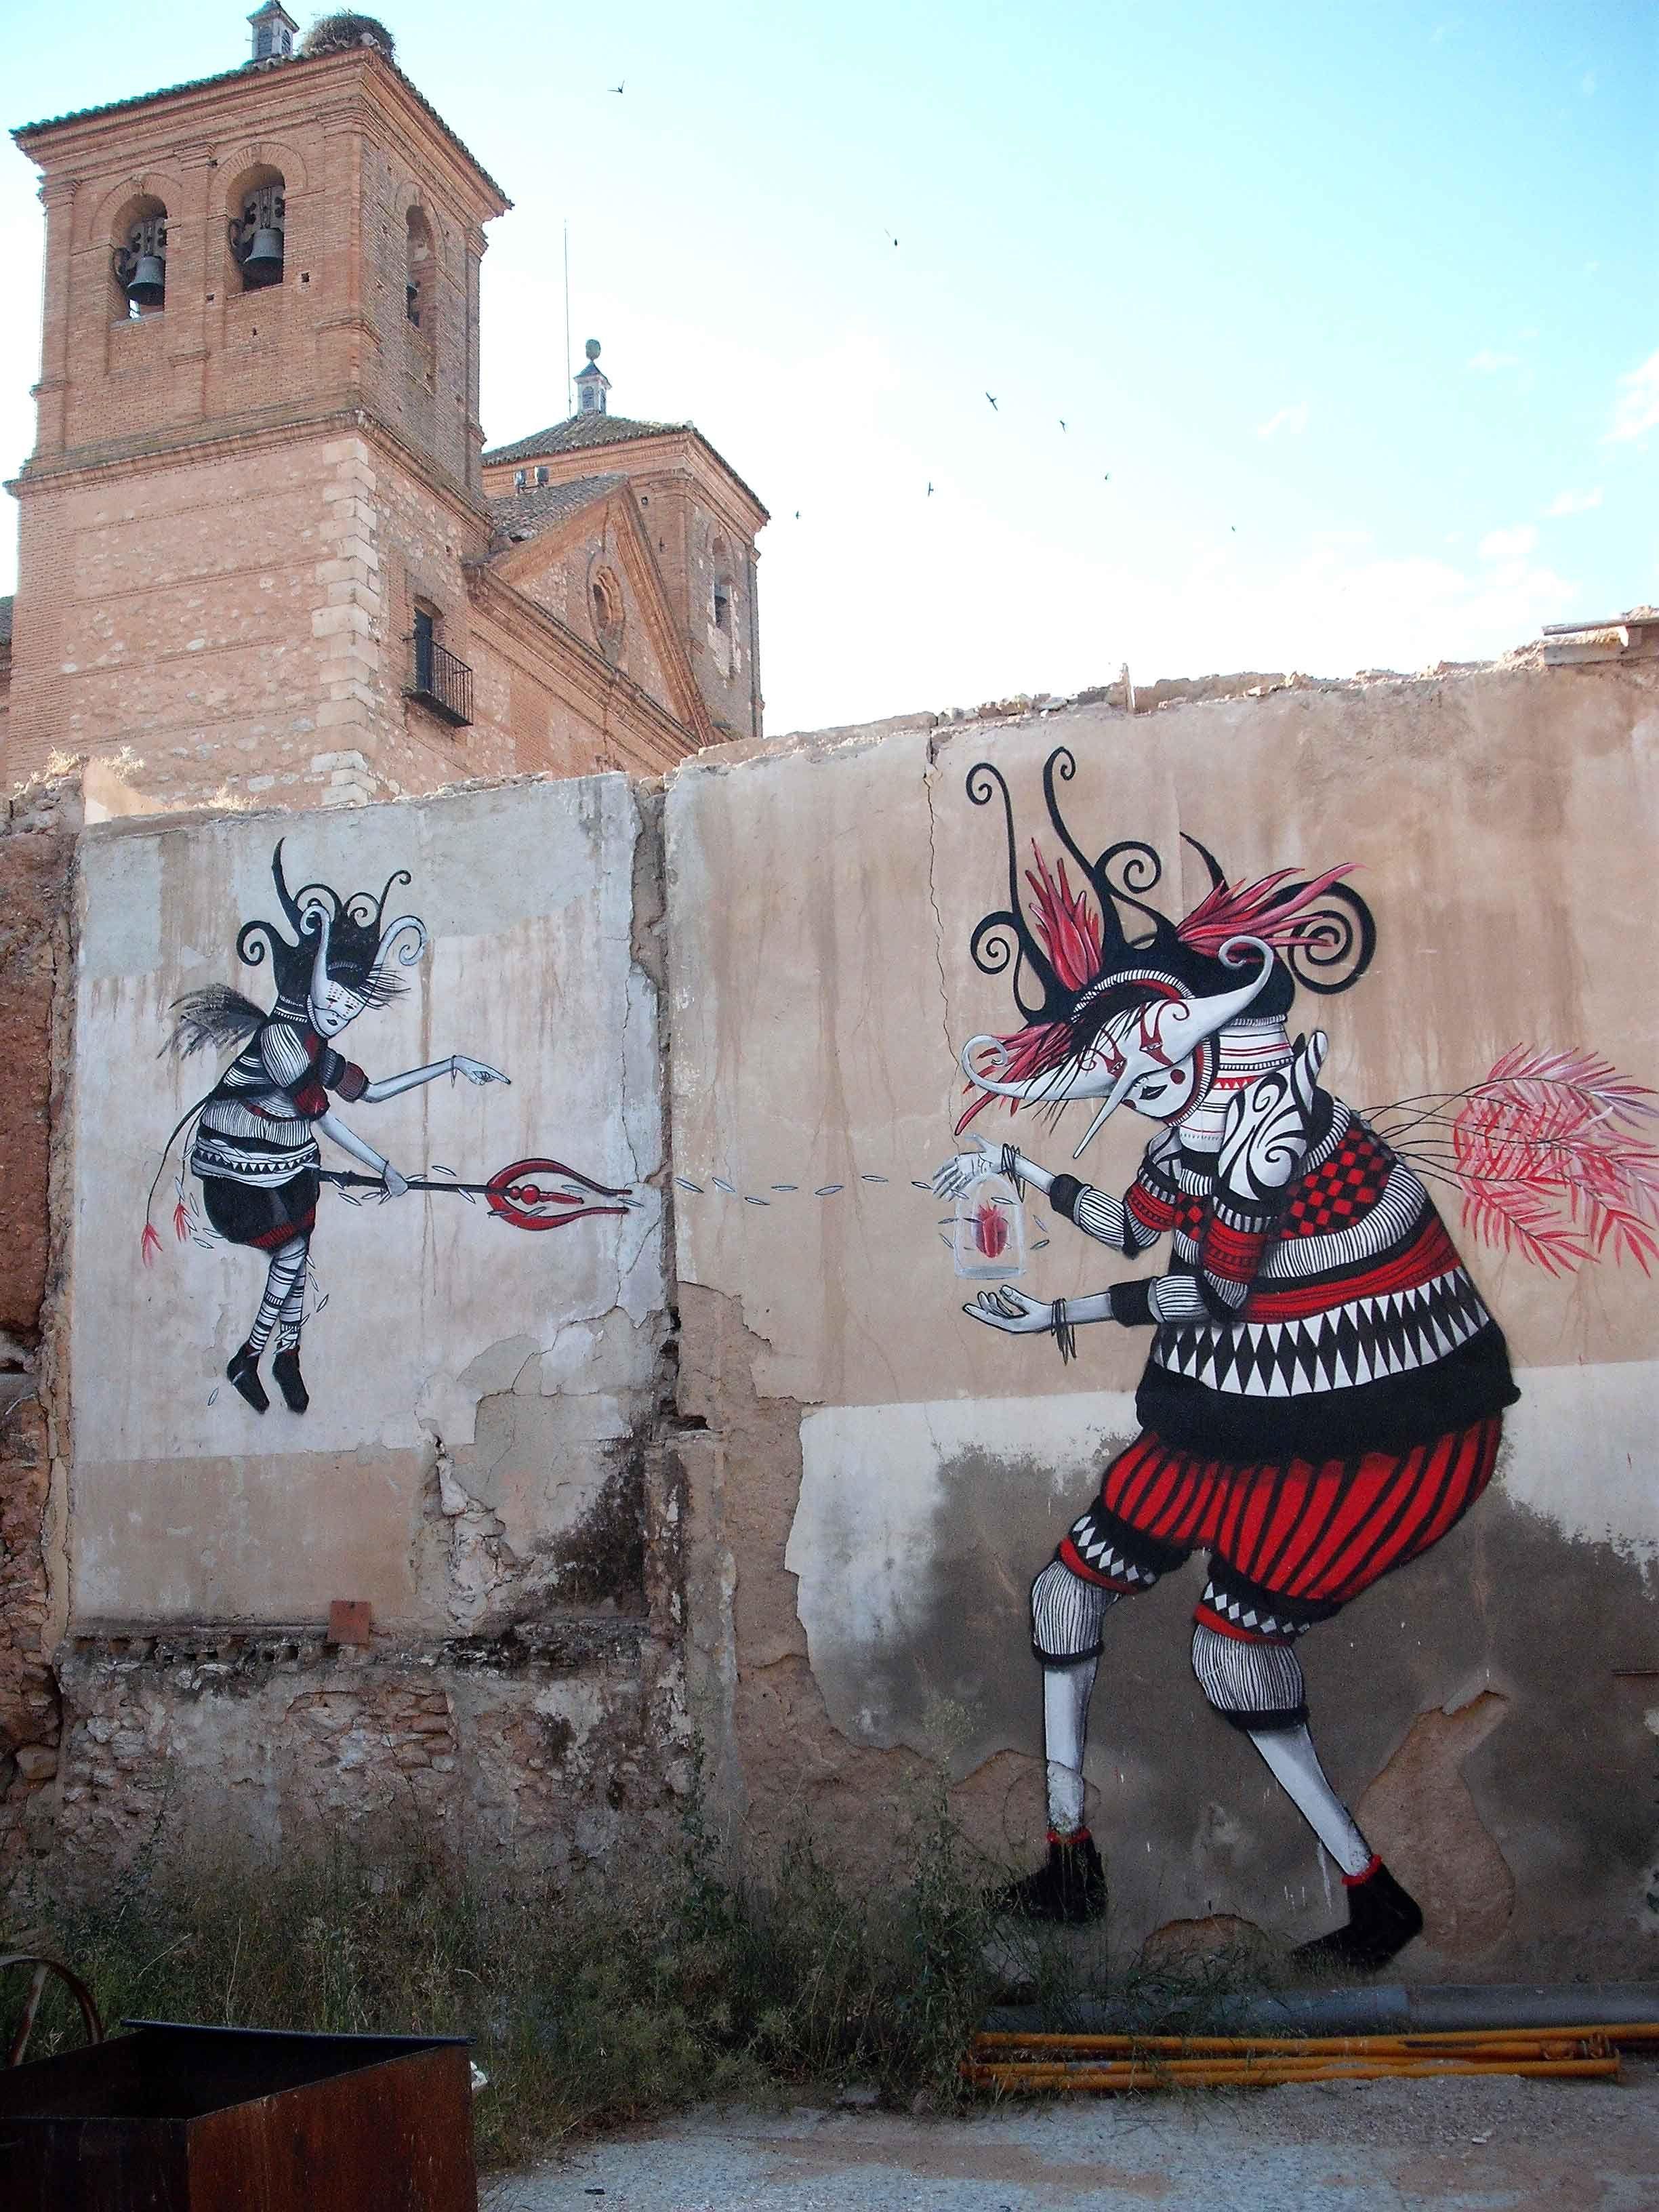 Skount - Street Artist and Art